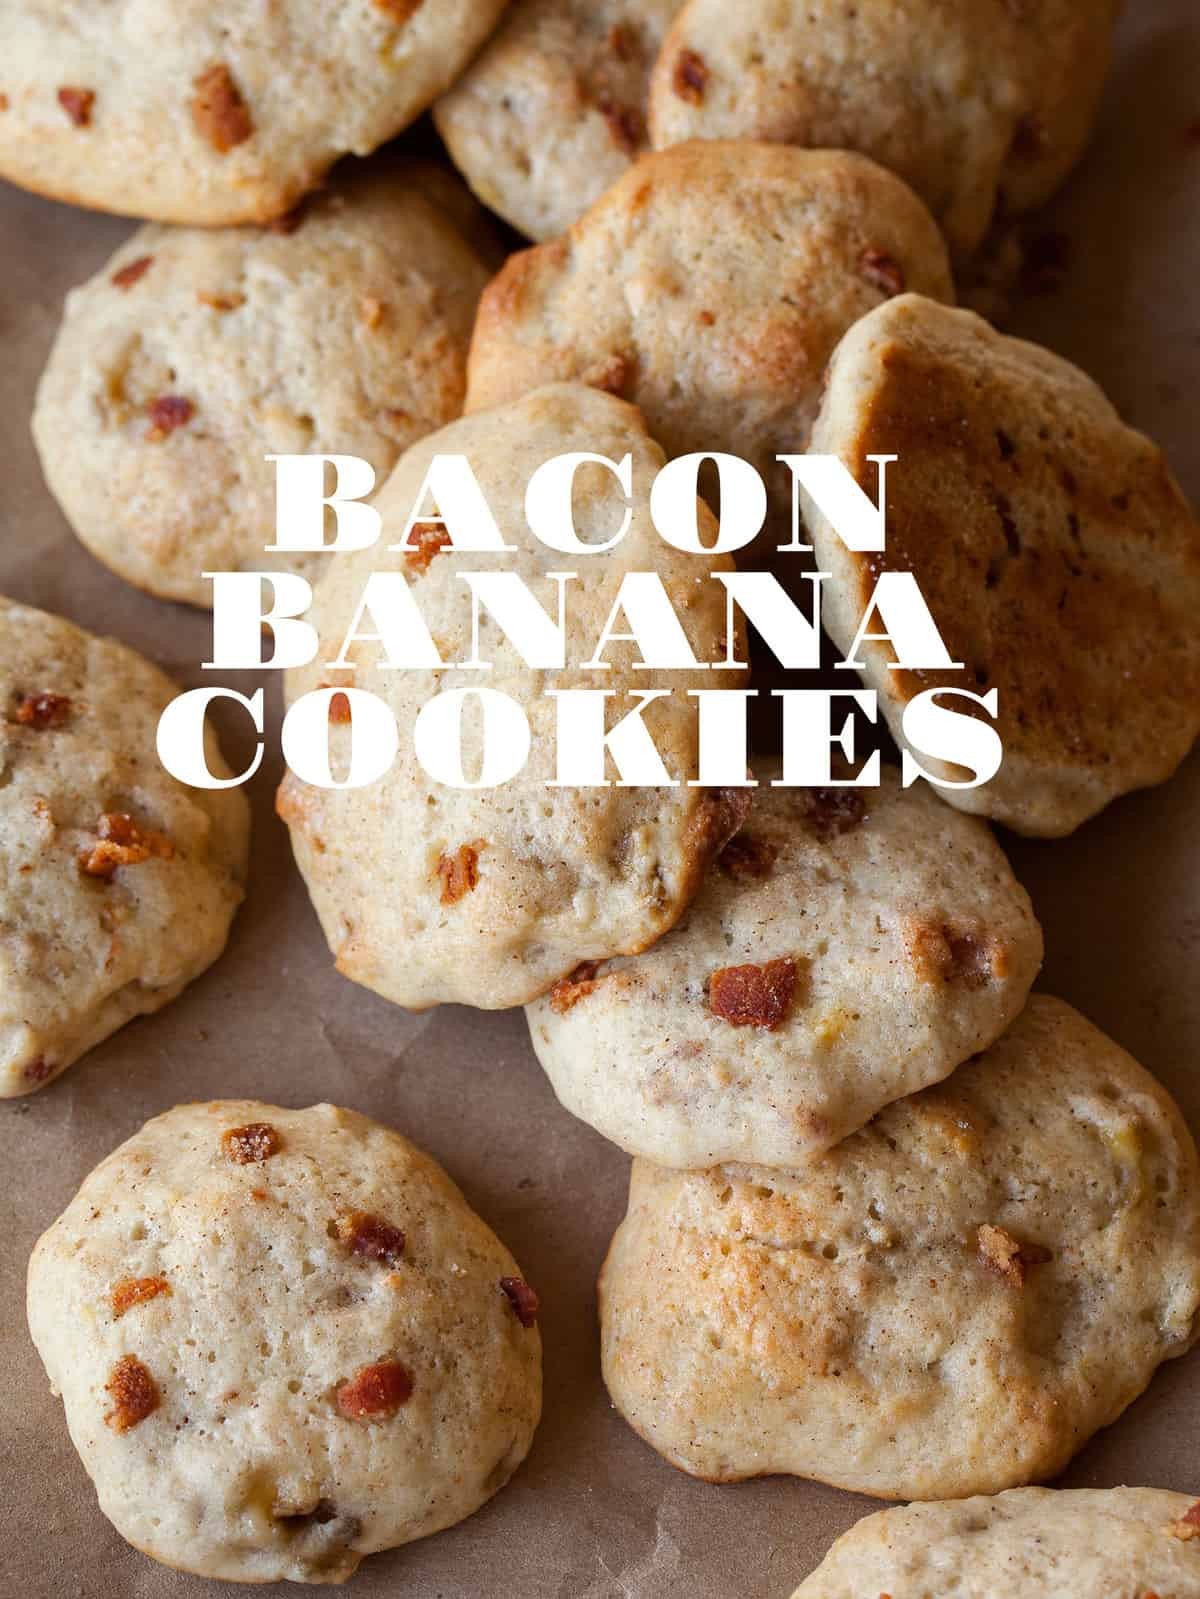 Bacon Banana Cookies | Cookie recipe | Spoon Fork Bacon